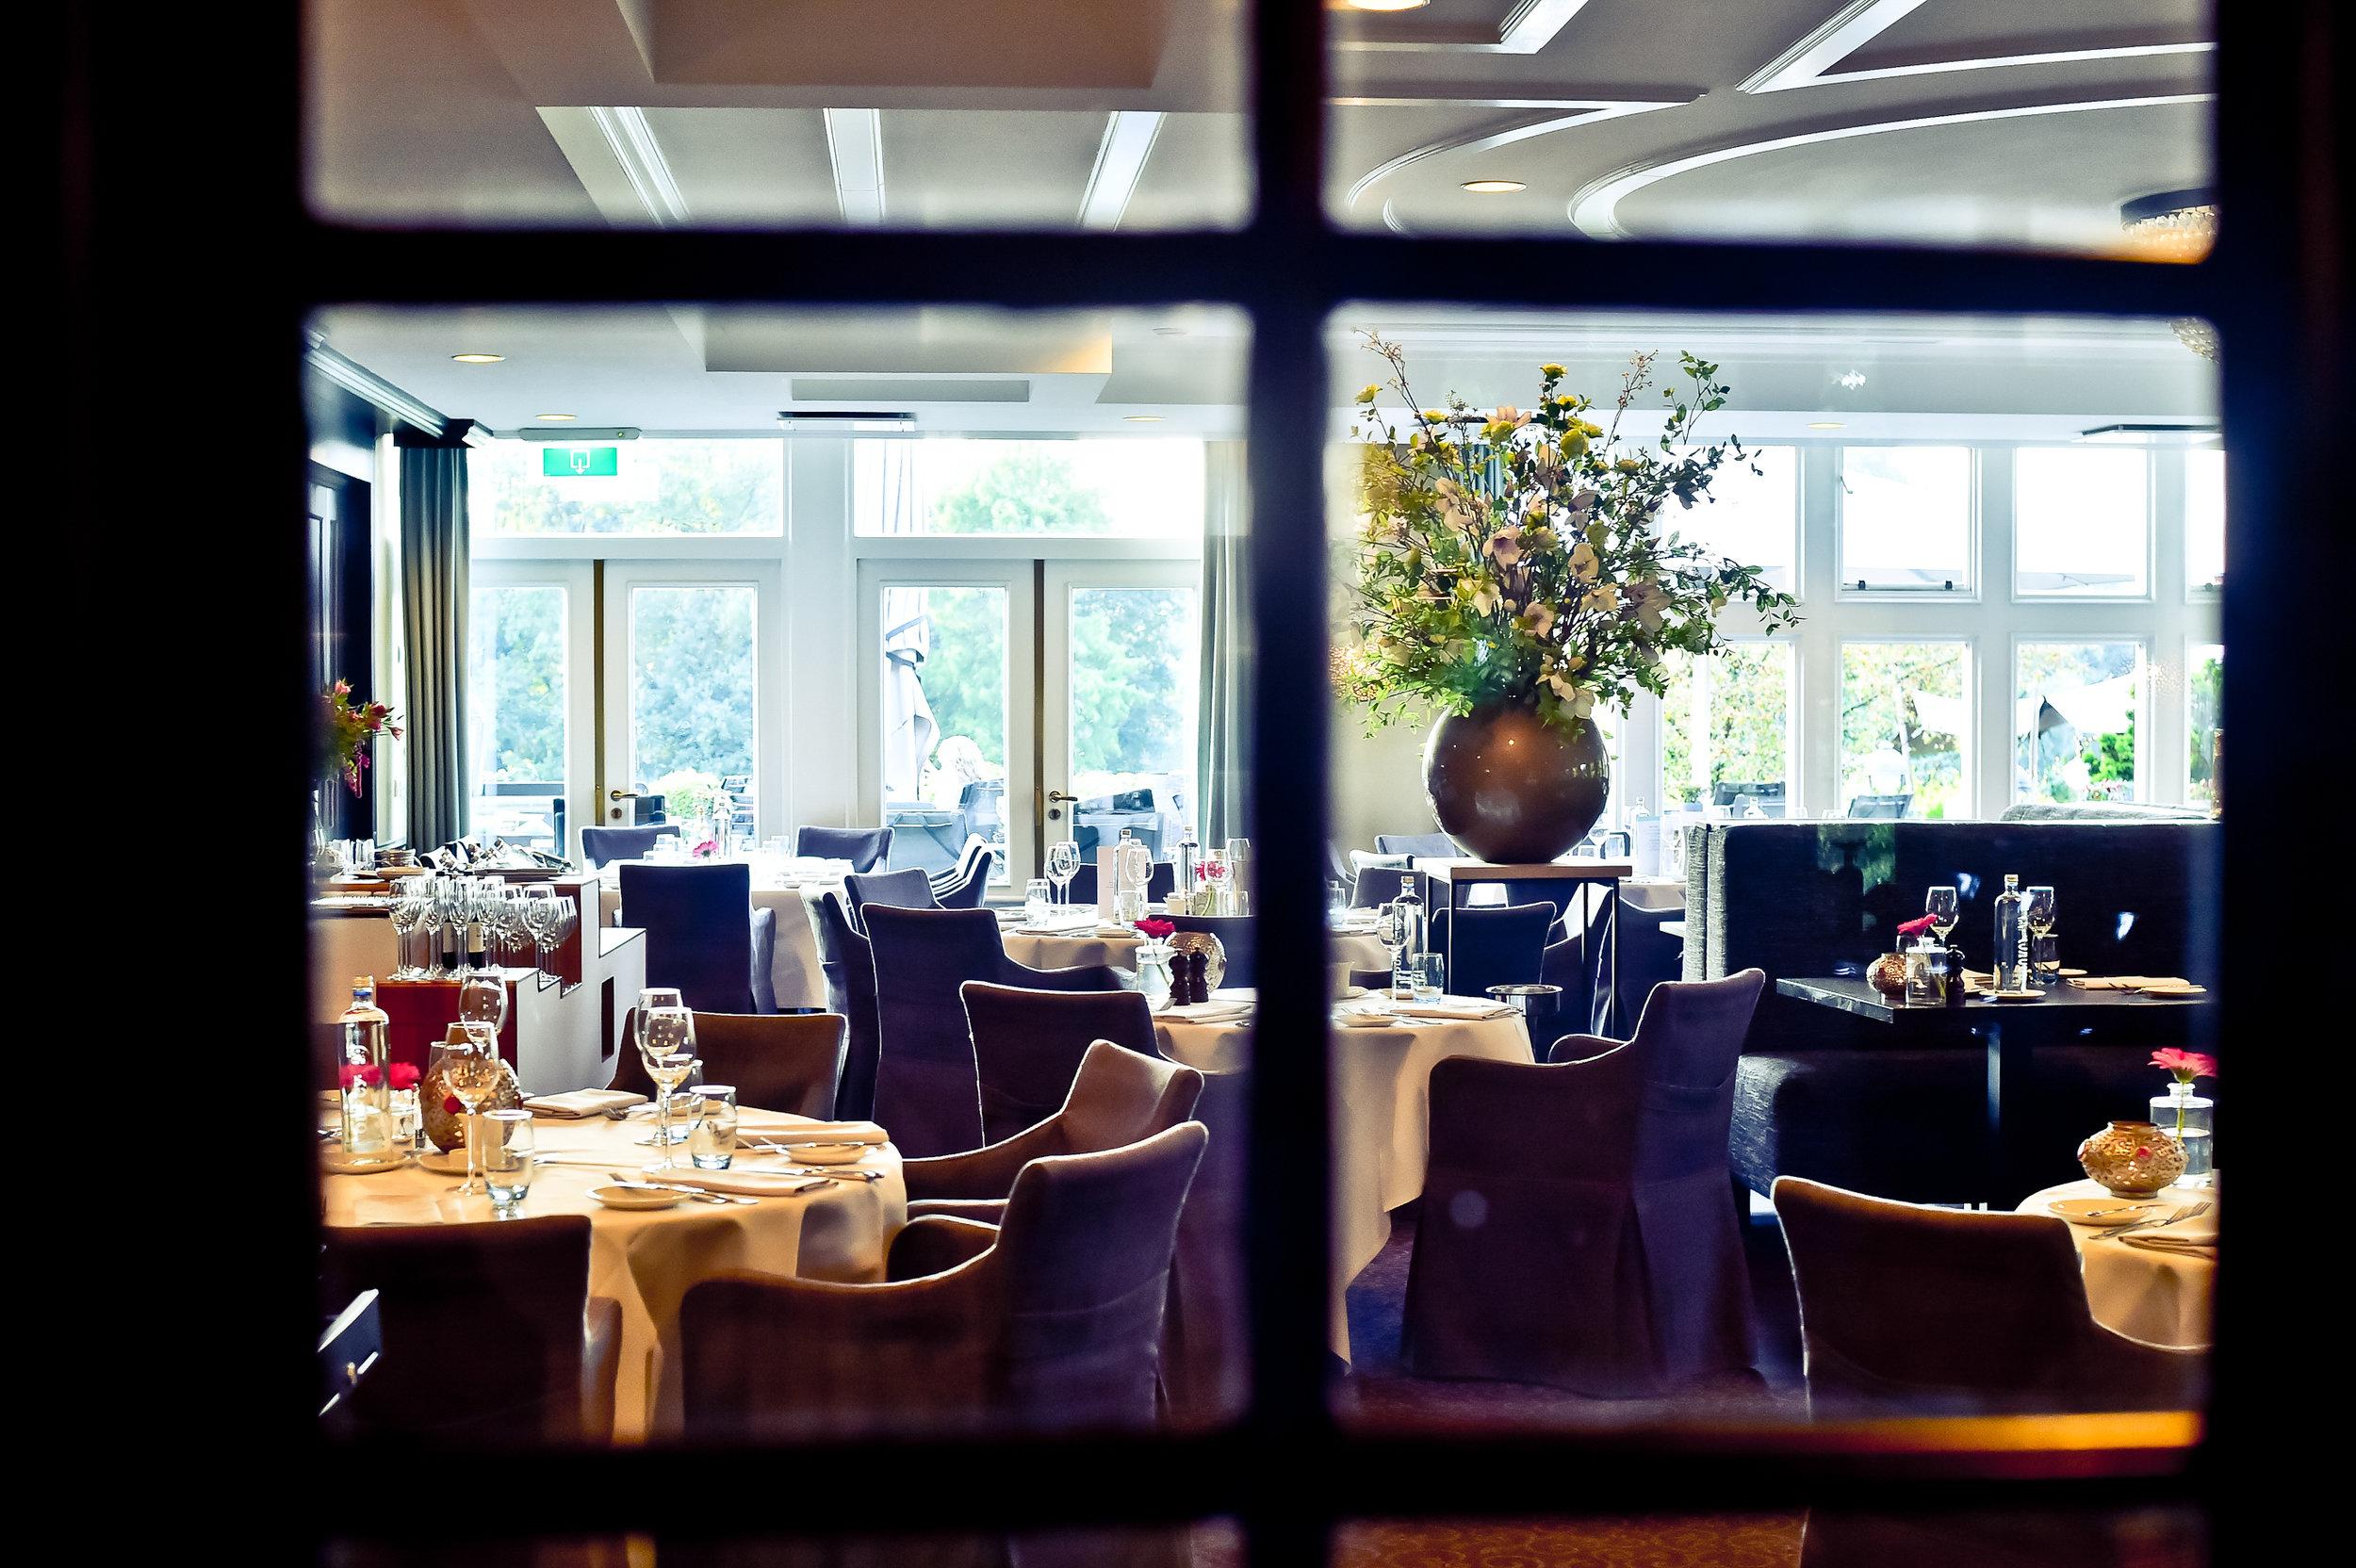 Glimpse of the restaurant